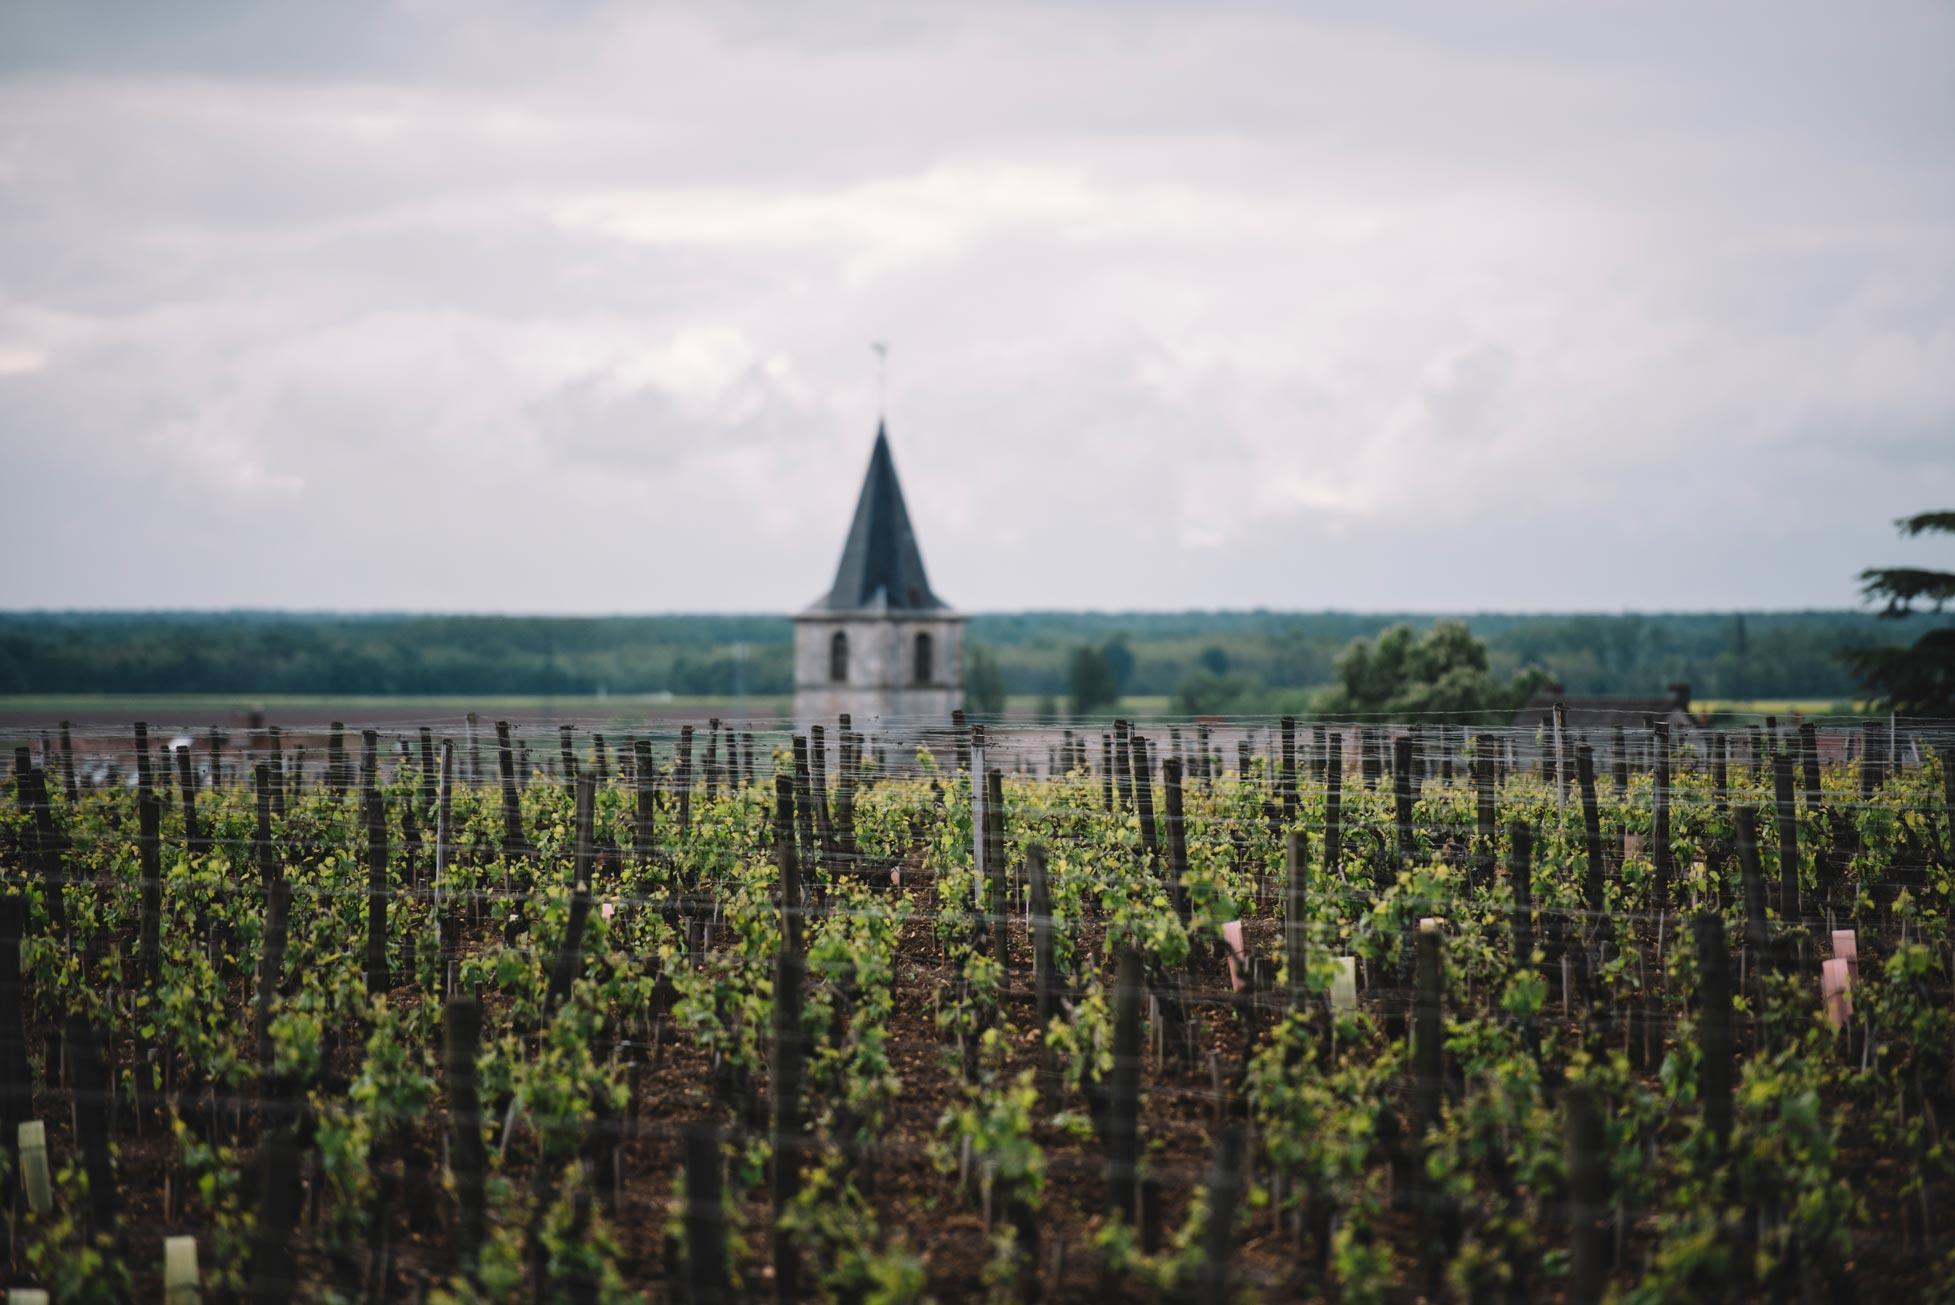 Tutoraggio in vigna   Domaine Leroy   Vosne-Romanée   Bourgogne